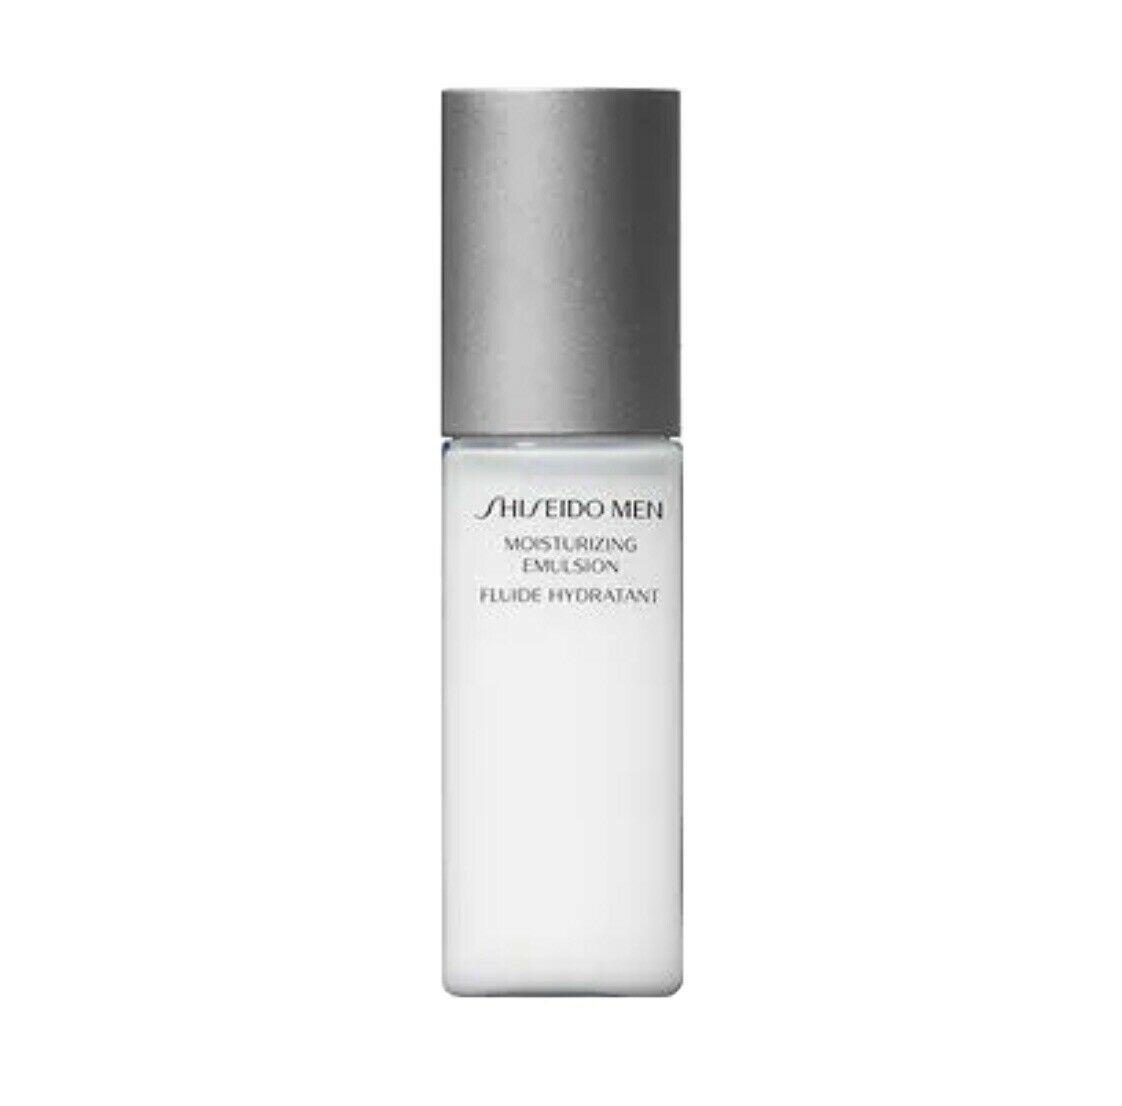 Shiseido Men Moisturizing Emulsion, 3.3 fl oz - $36.05